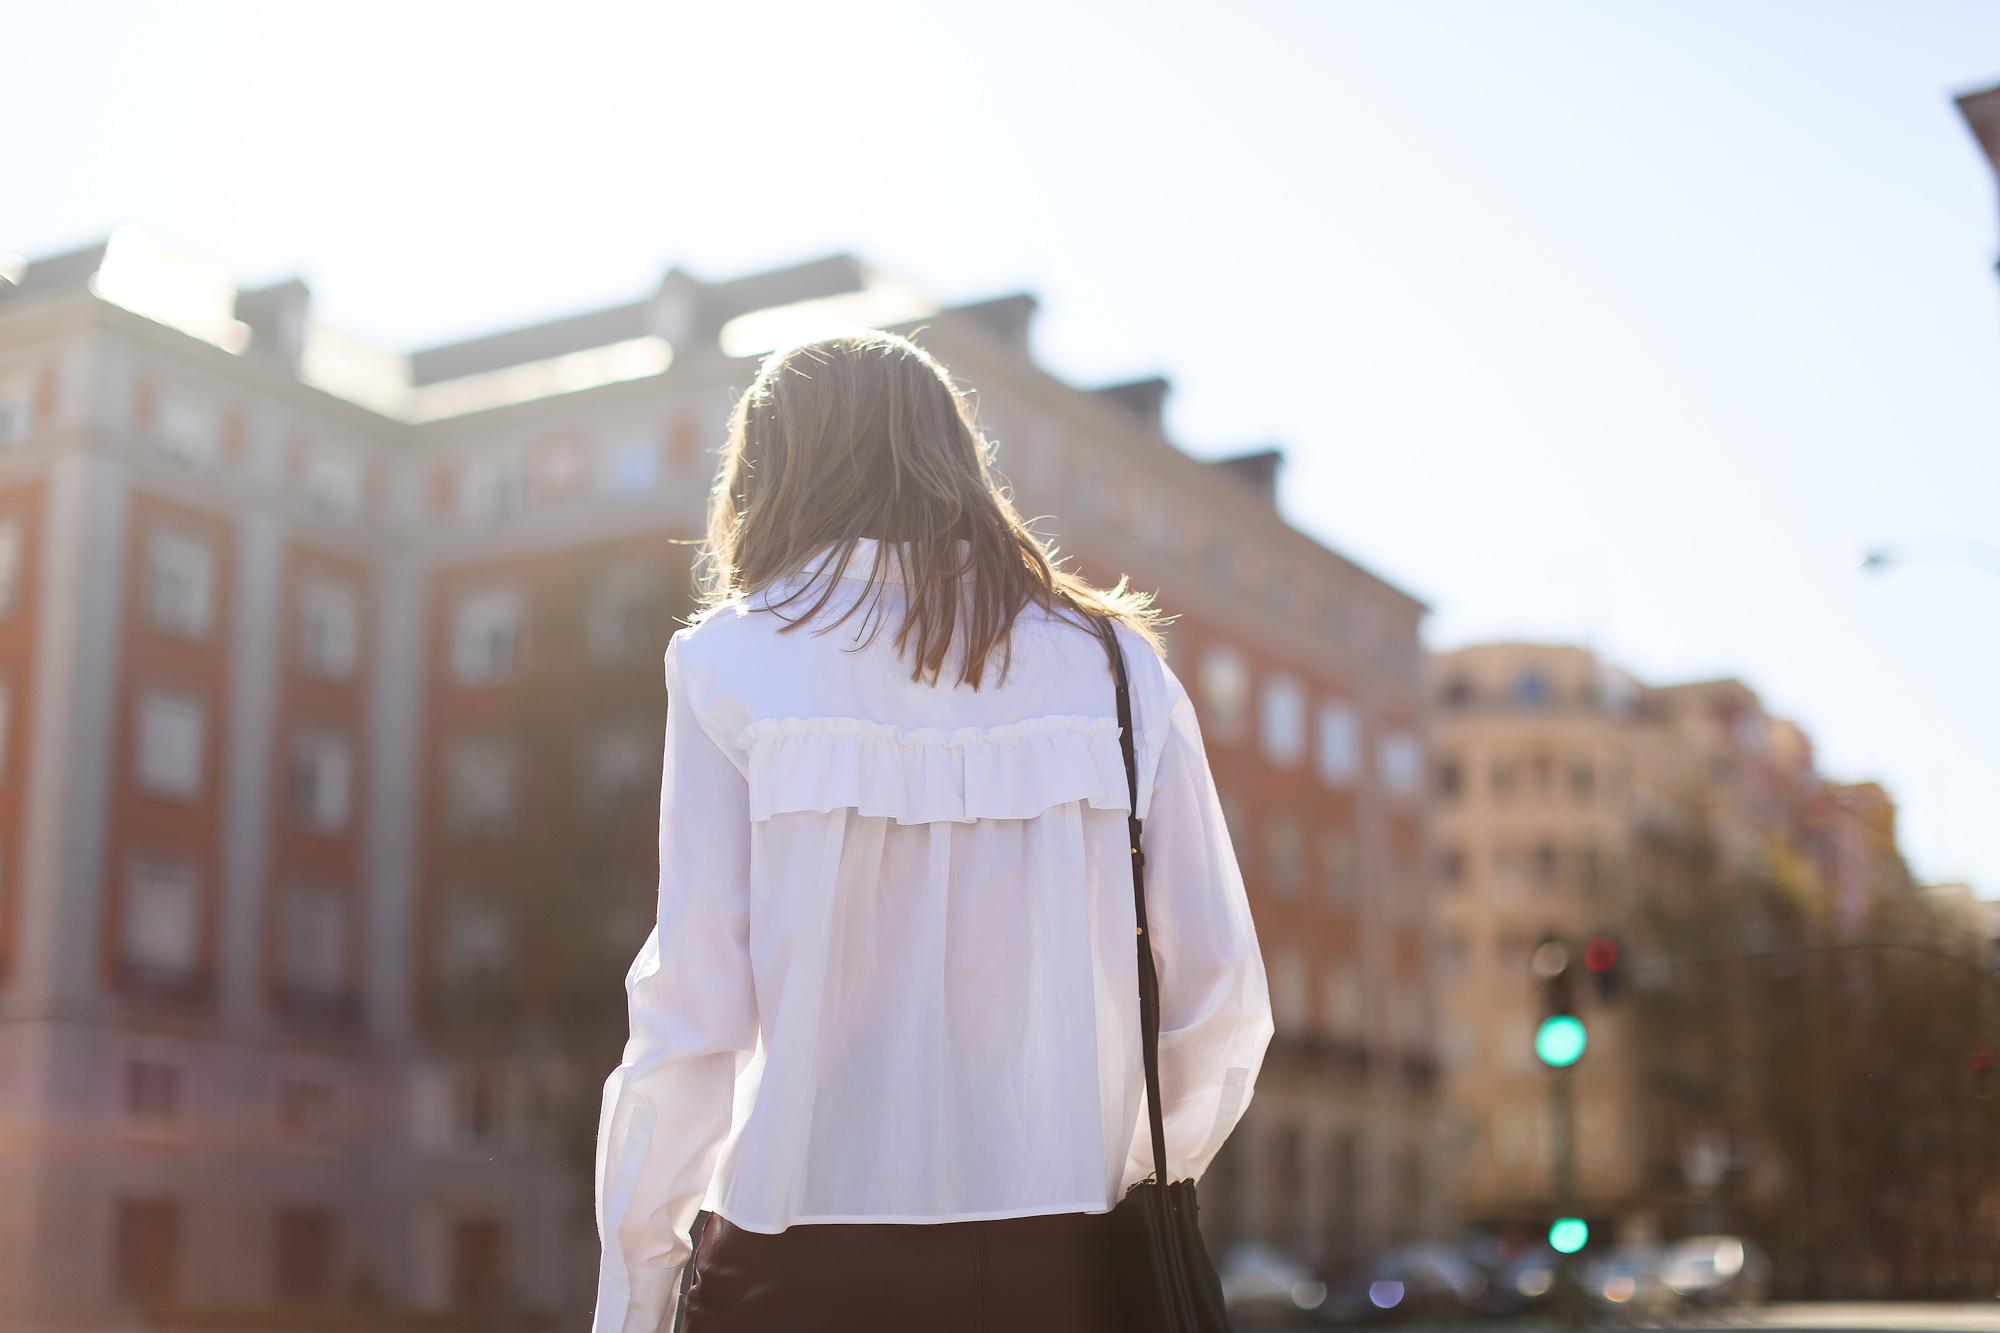 Clochet_streetstyle_maxandCo_leatherminiskirt_h&mtrend_blouse_sandroparis-brogues-7